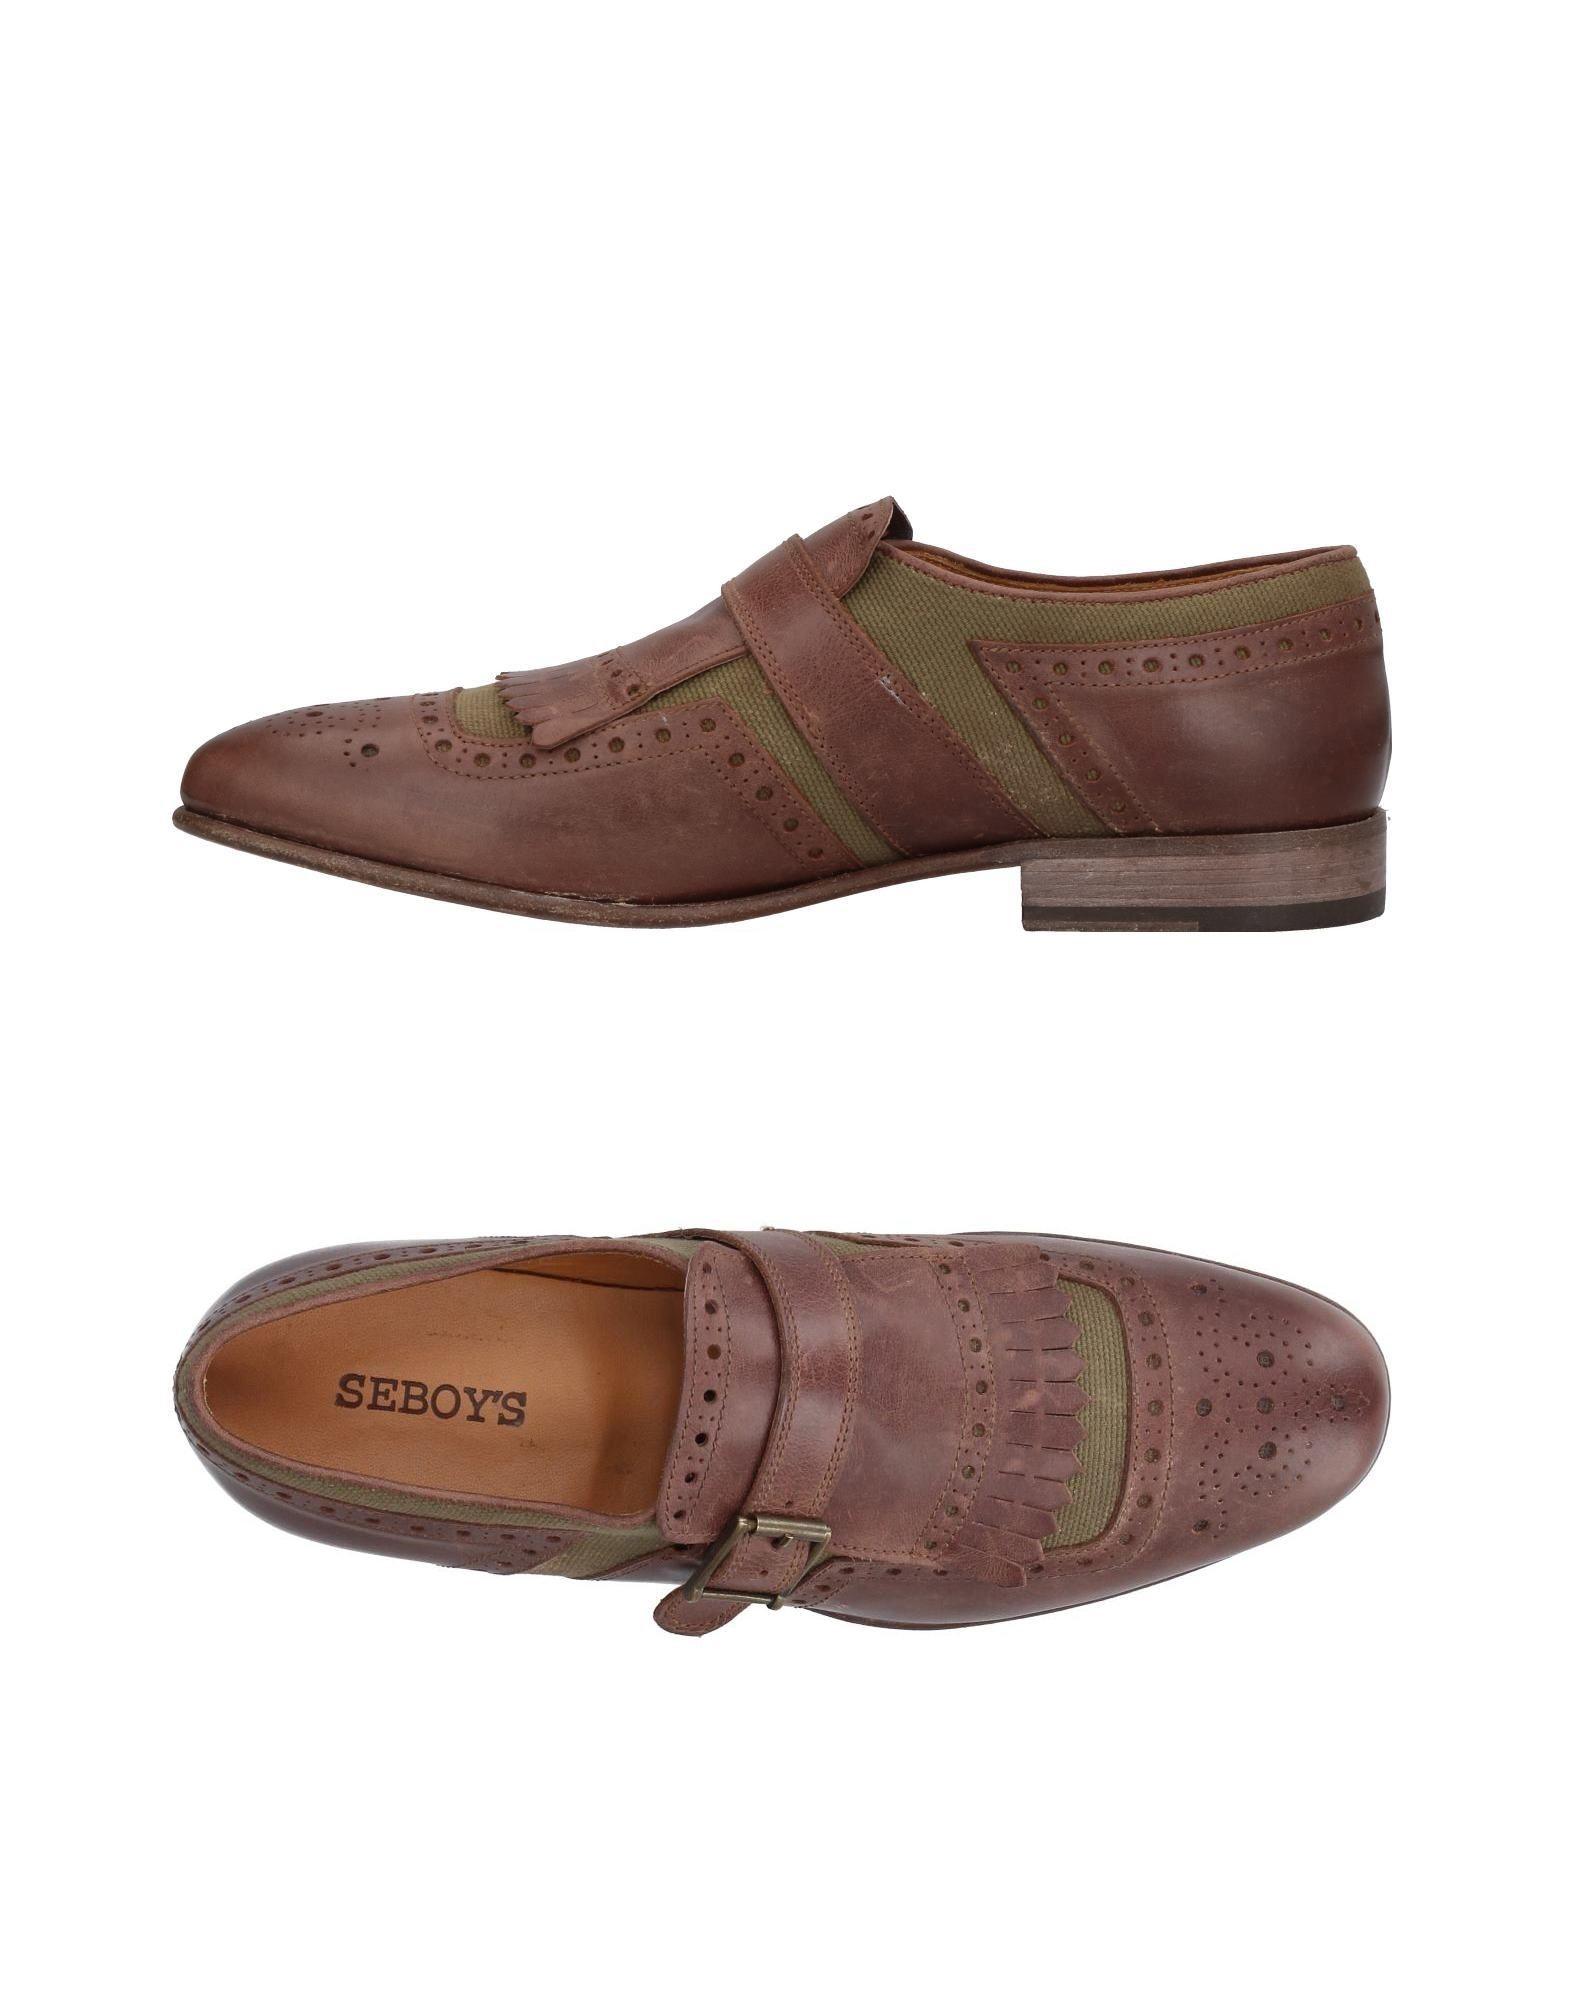 SEBOYS Loafers in Brown